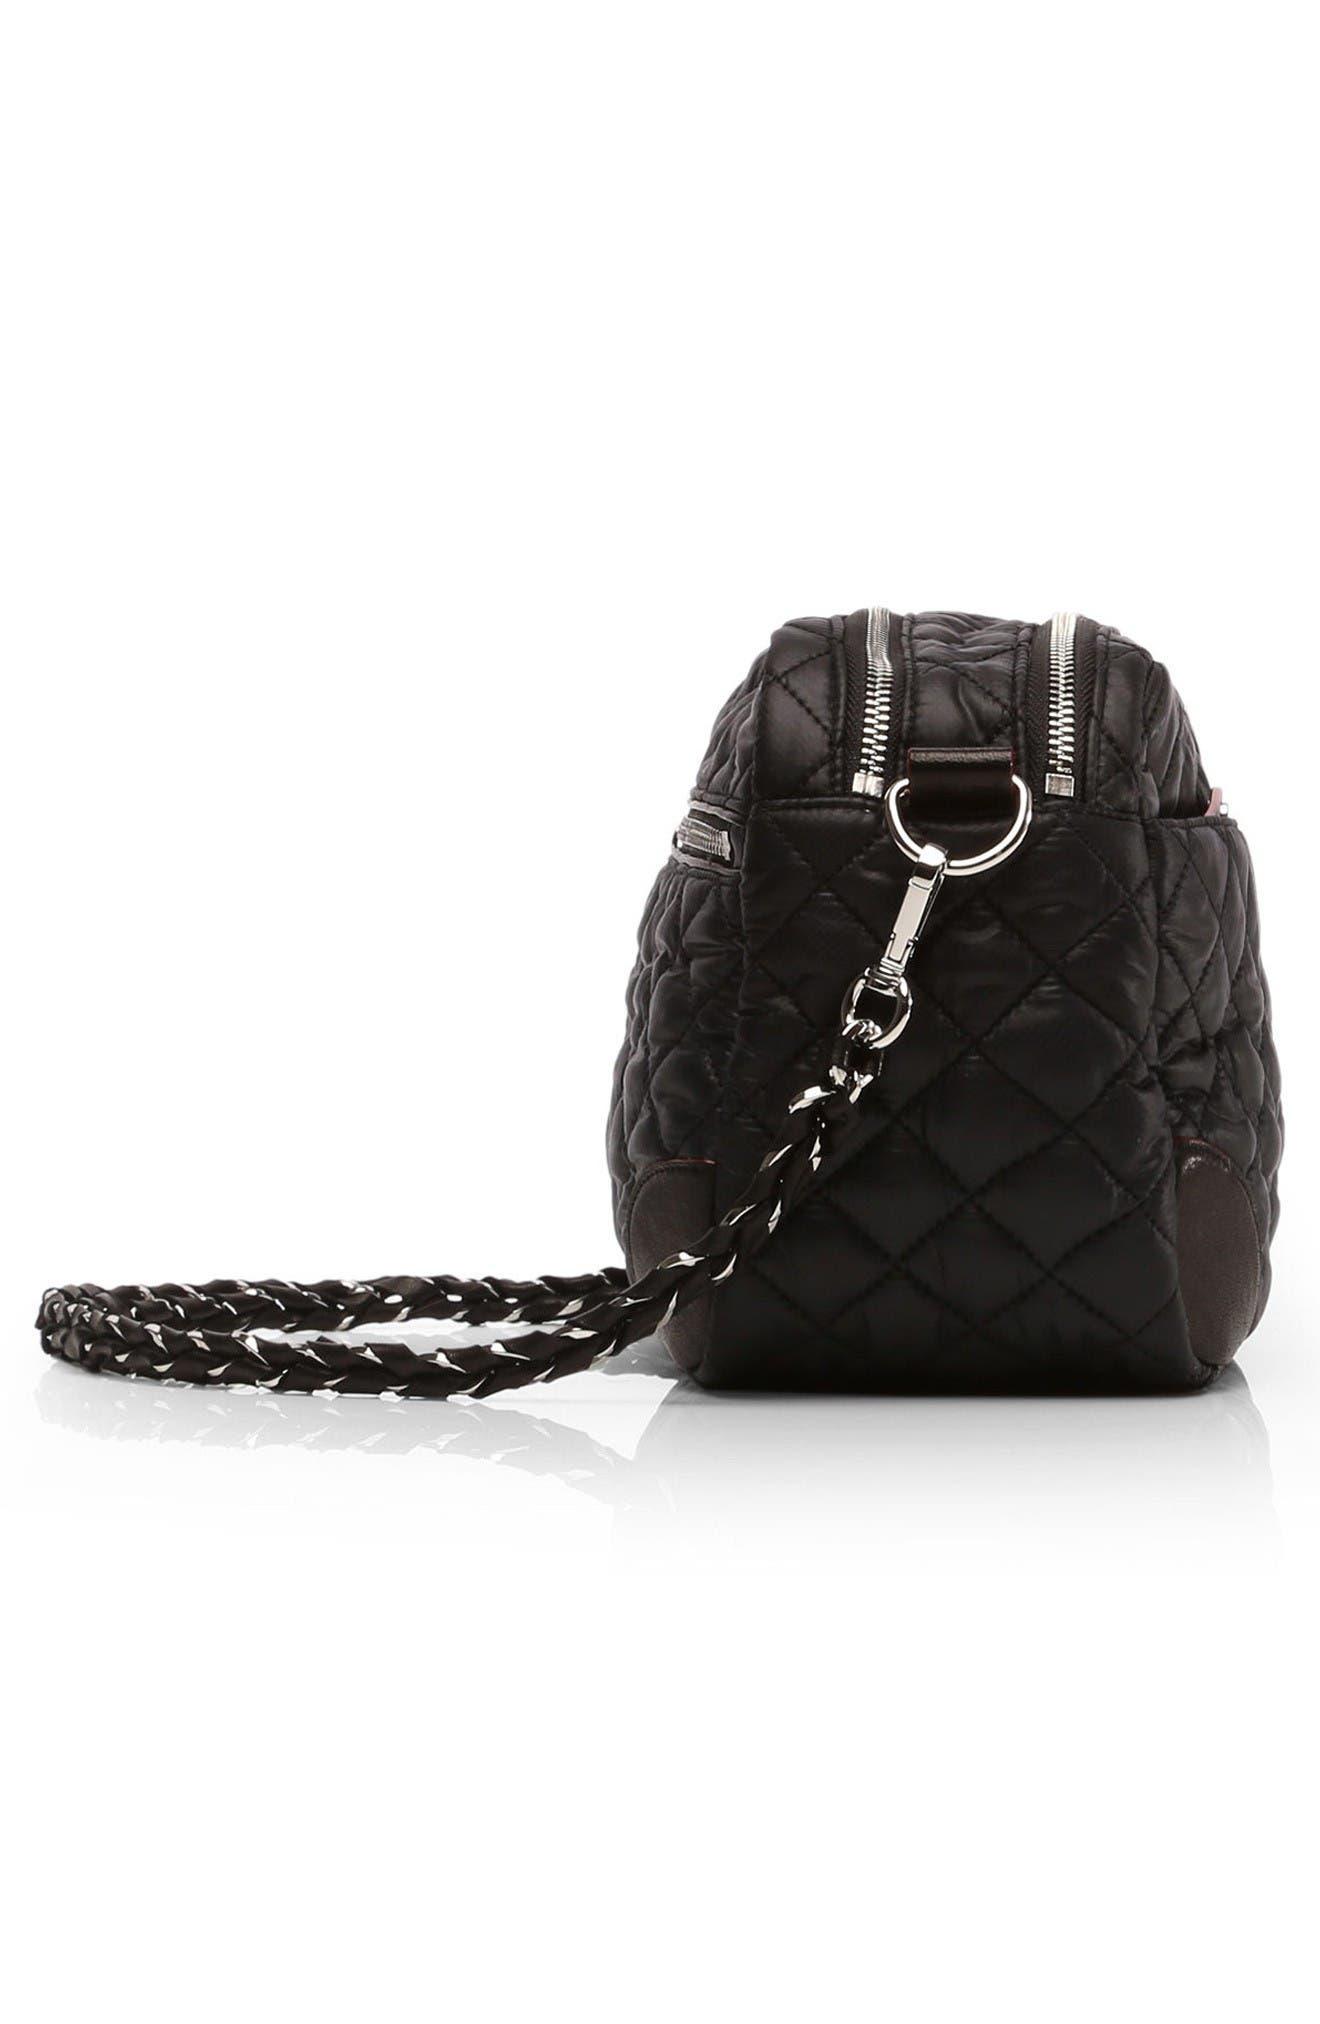 Small Crosby Bag,                             Alternate thumbnail 3, color,                             Black